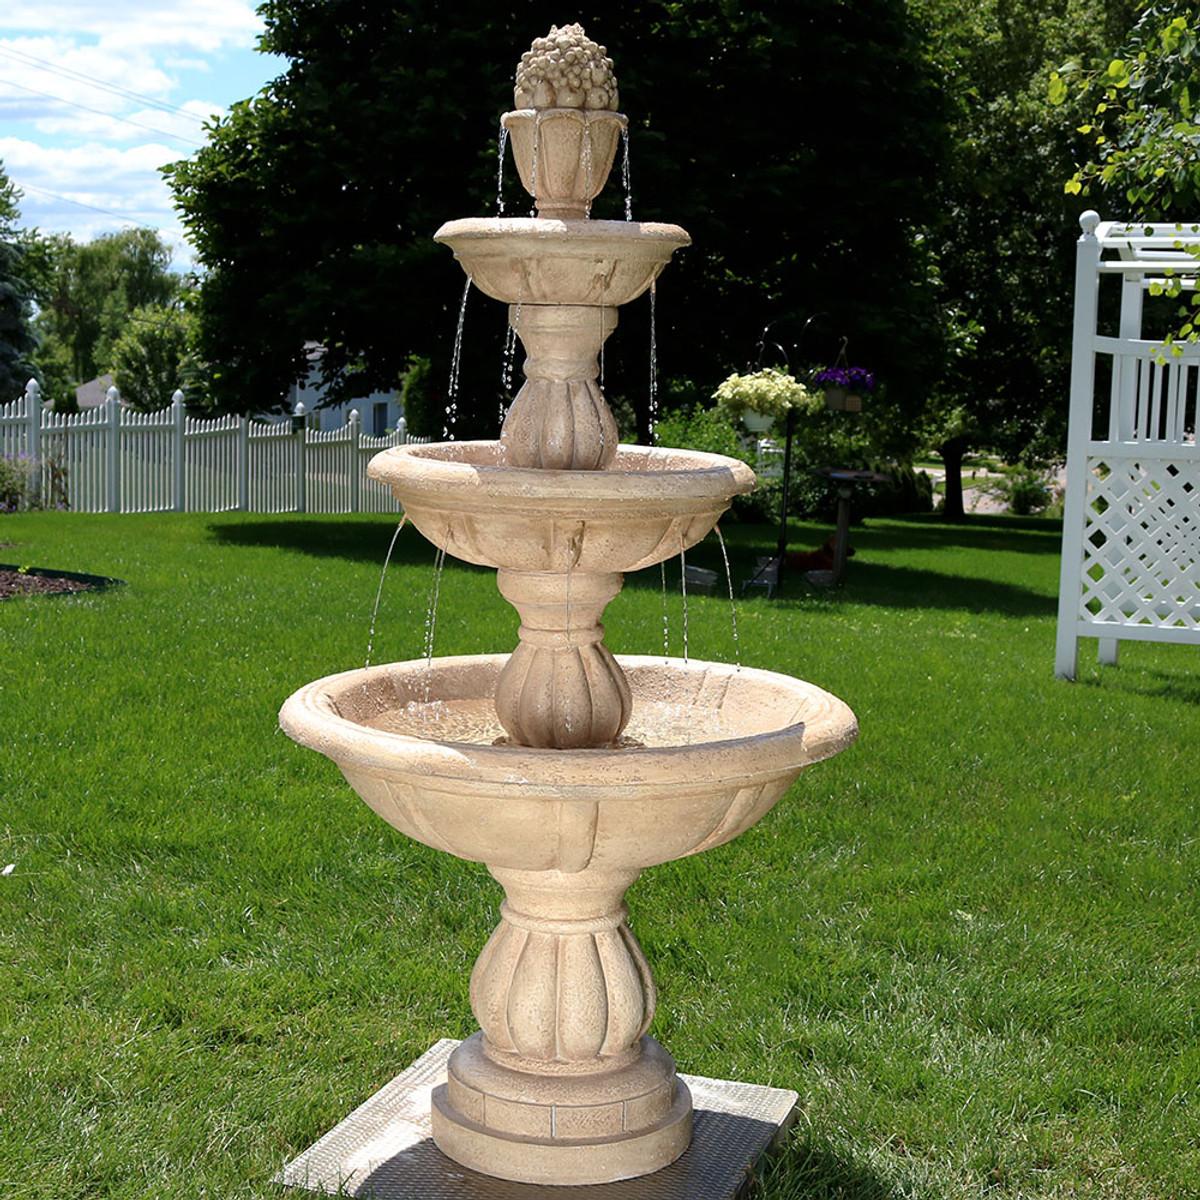 Sunnydaze 3-Tier Cornucopia Outdoor Water Fountain